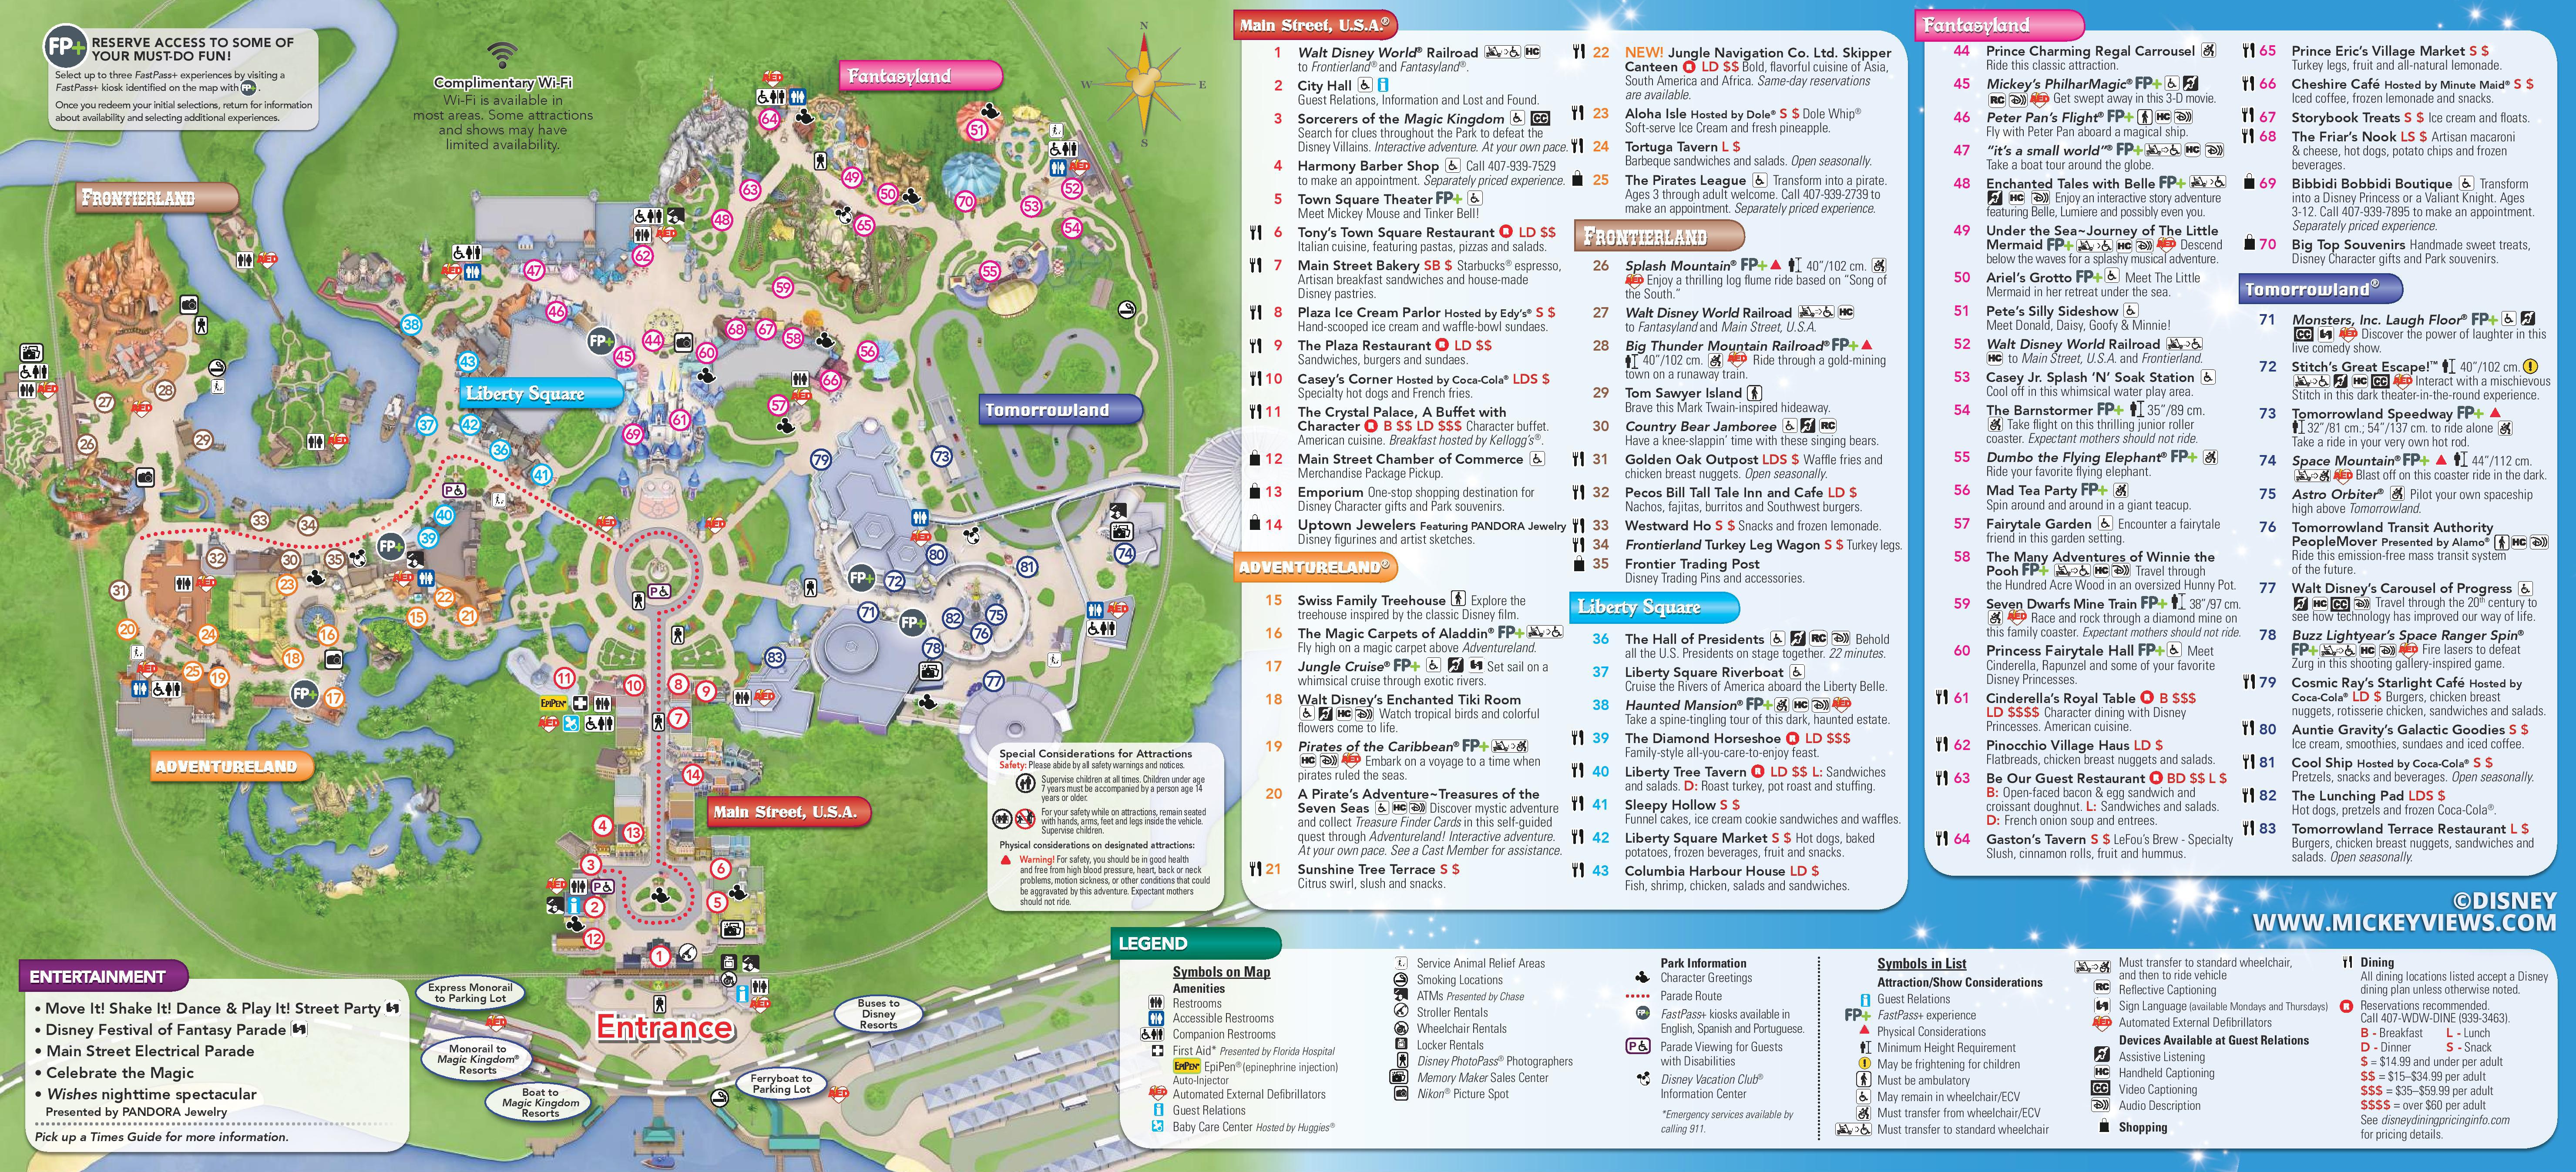 Map Of Disney World Hotels And Theme Parks Maps Of Disneyland Resort - Disney Hotels Florida Map